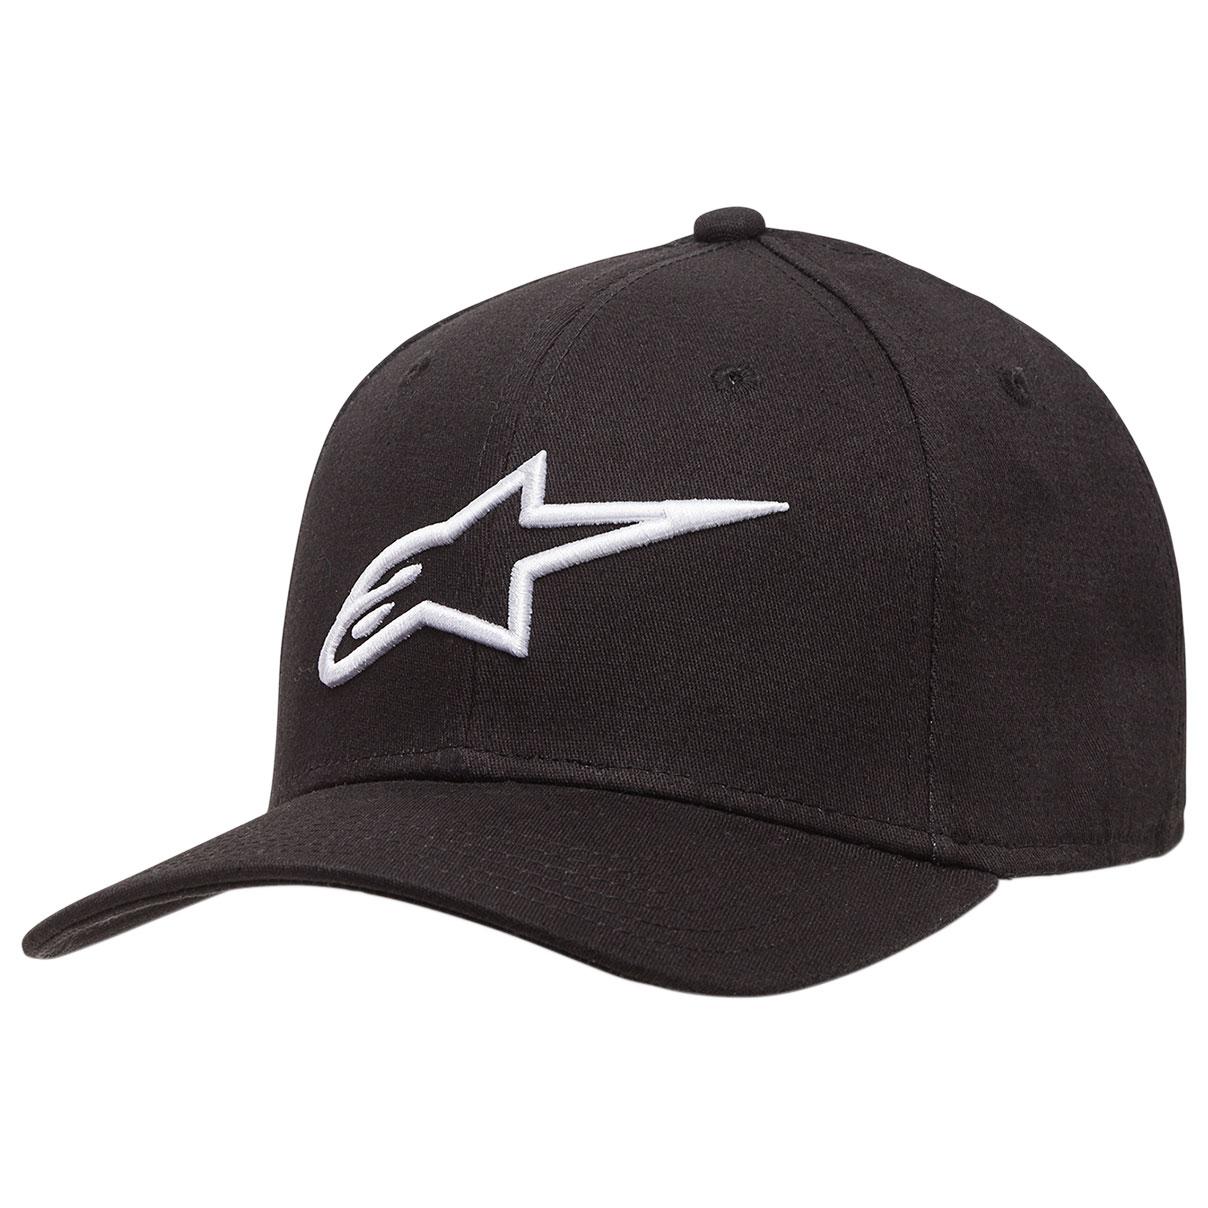 Alpinestars Men's Ageless Black/White Curved Bill Hat